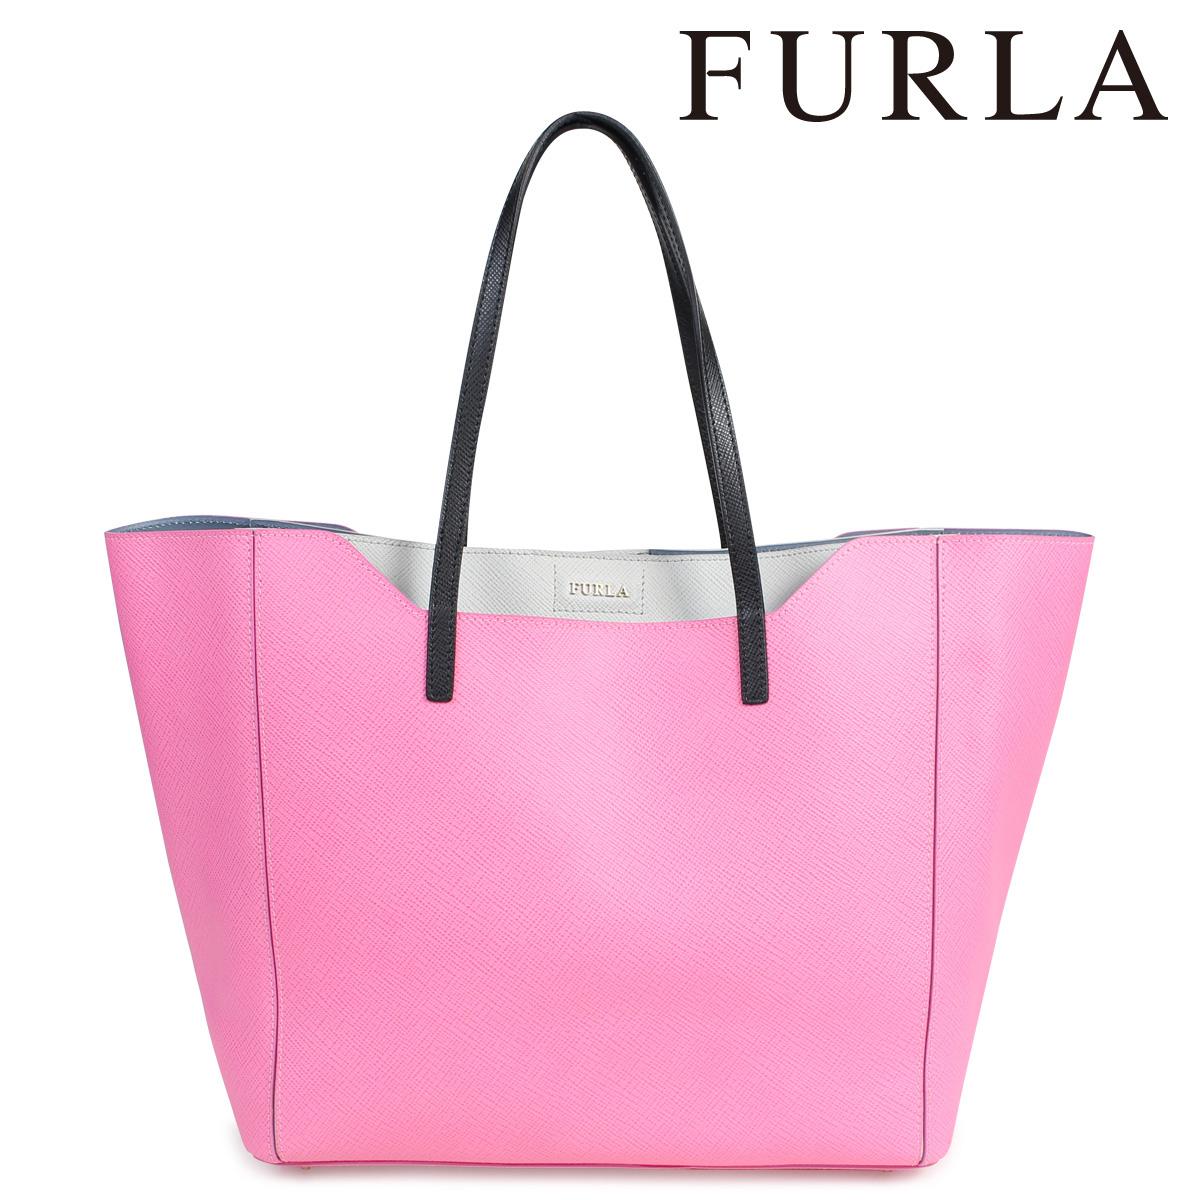 FURLA フルラ バッグ トートバッグ ショルダー レディース ピンク GRUPPO 791718